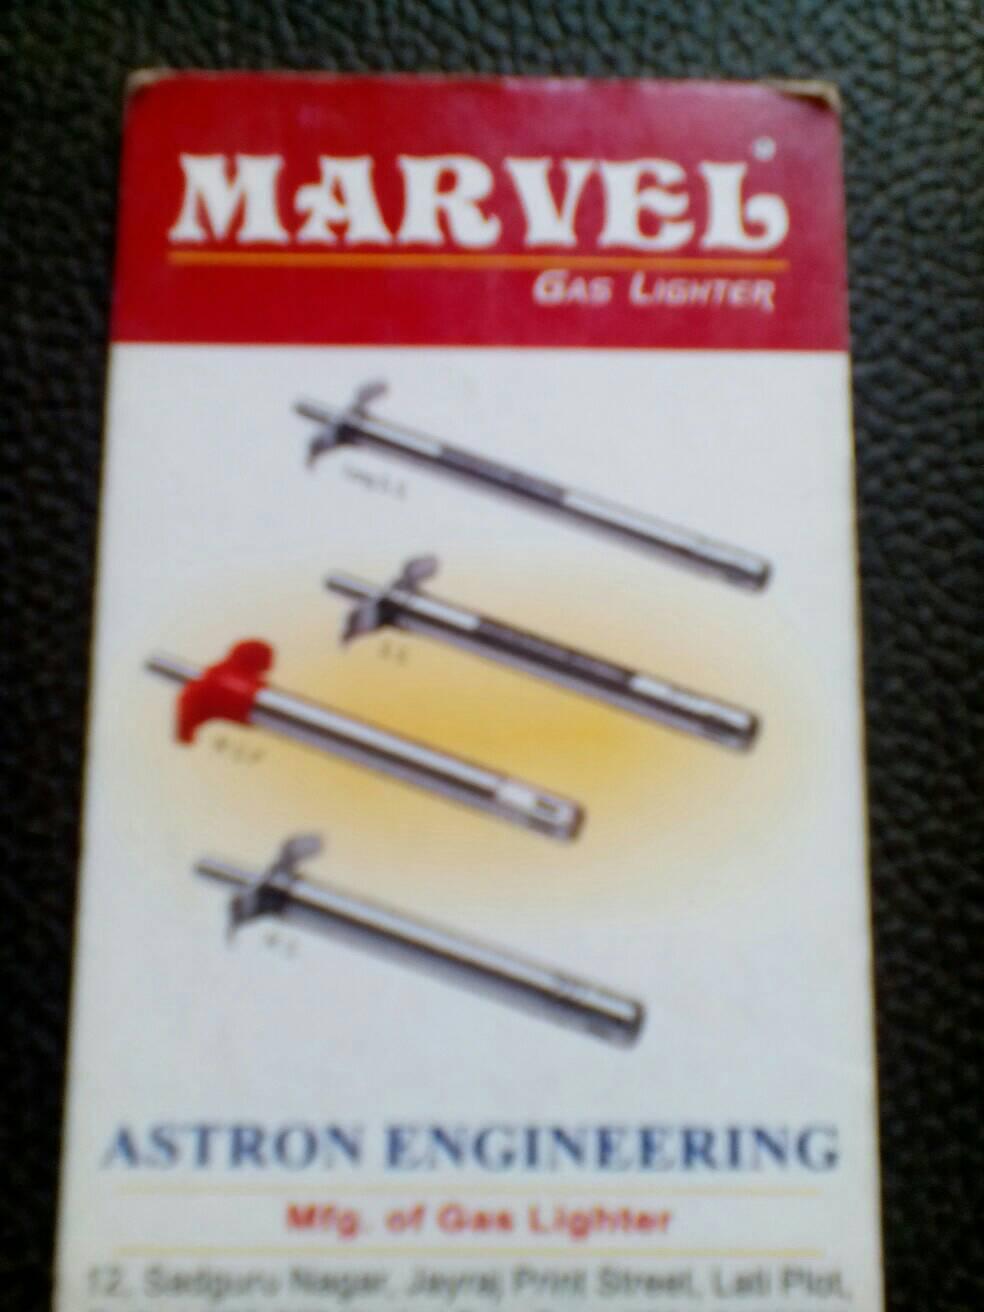 Astron Engineering